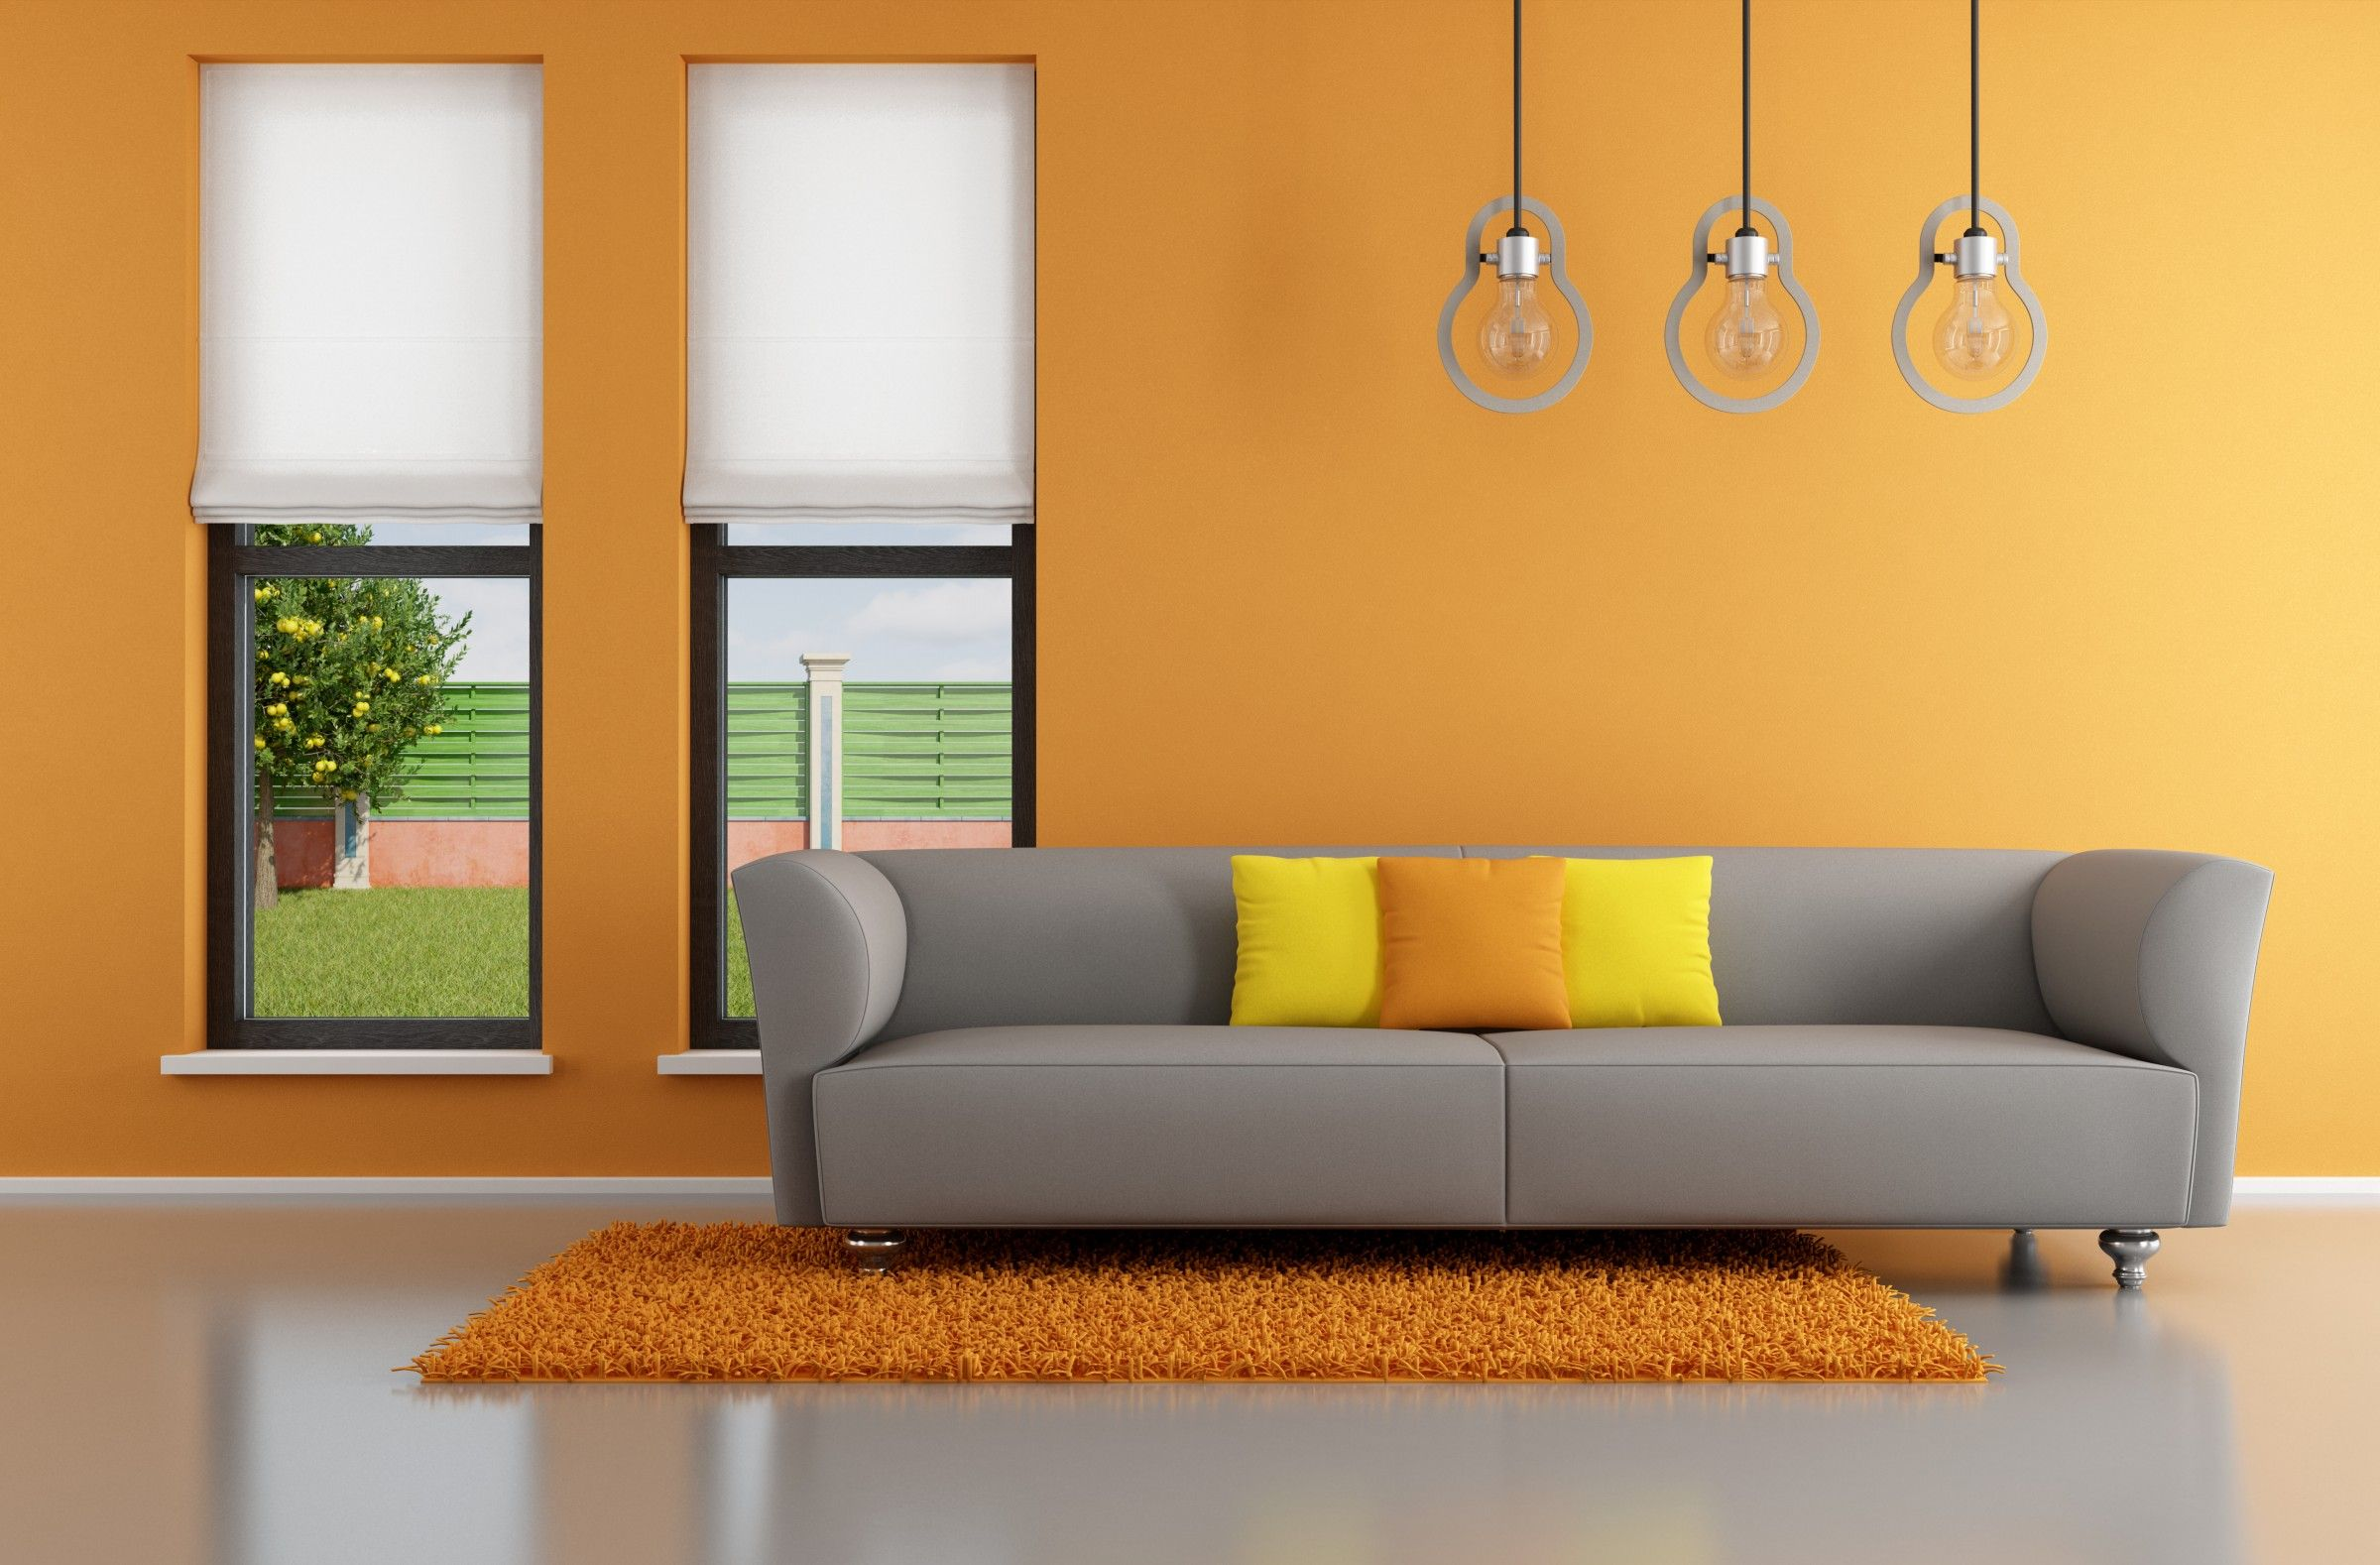 Architecture Inspiring Living Room Interior Decorating Ideas With